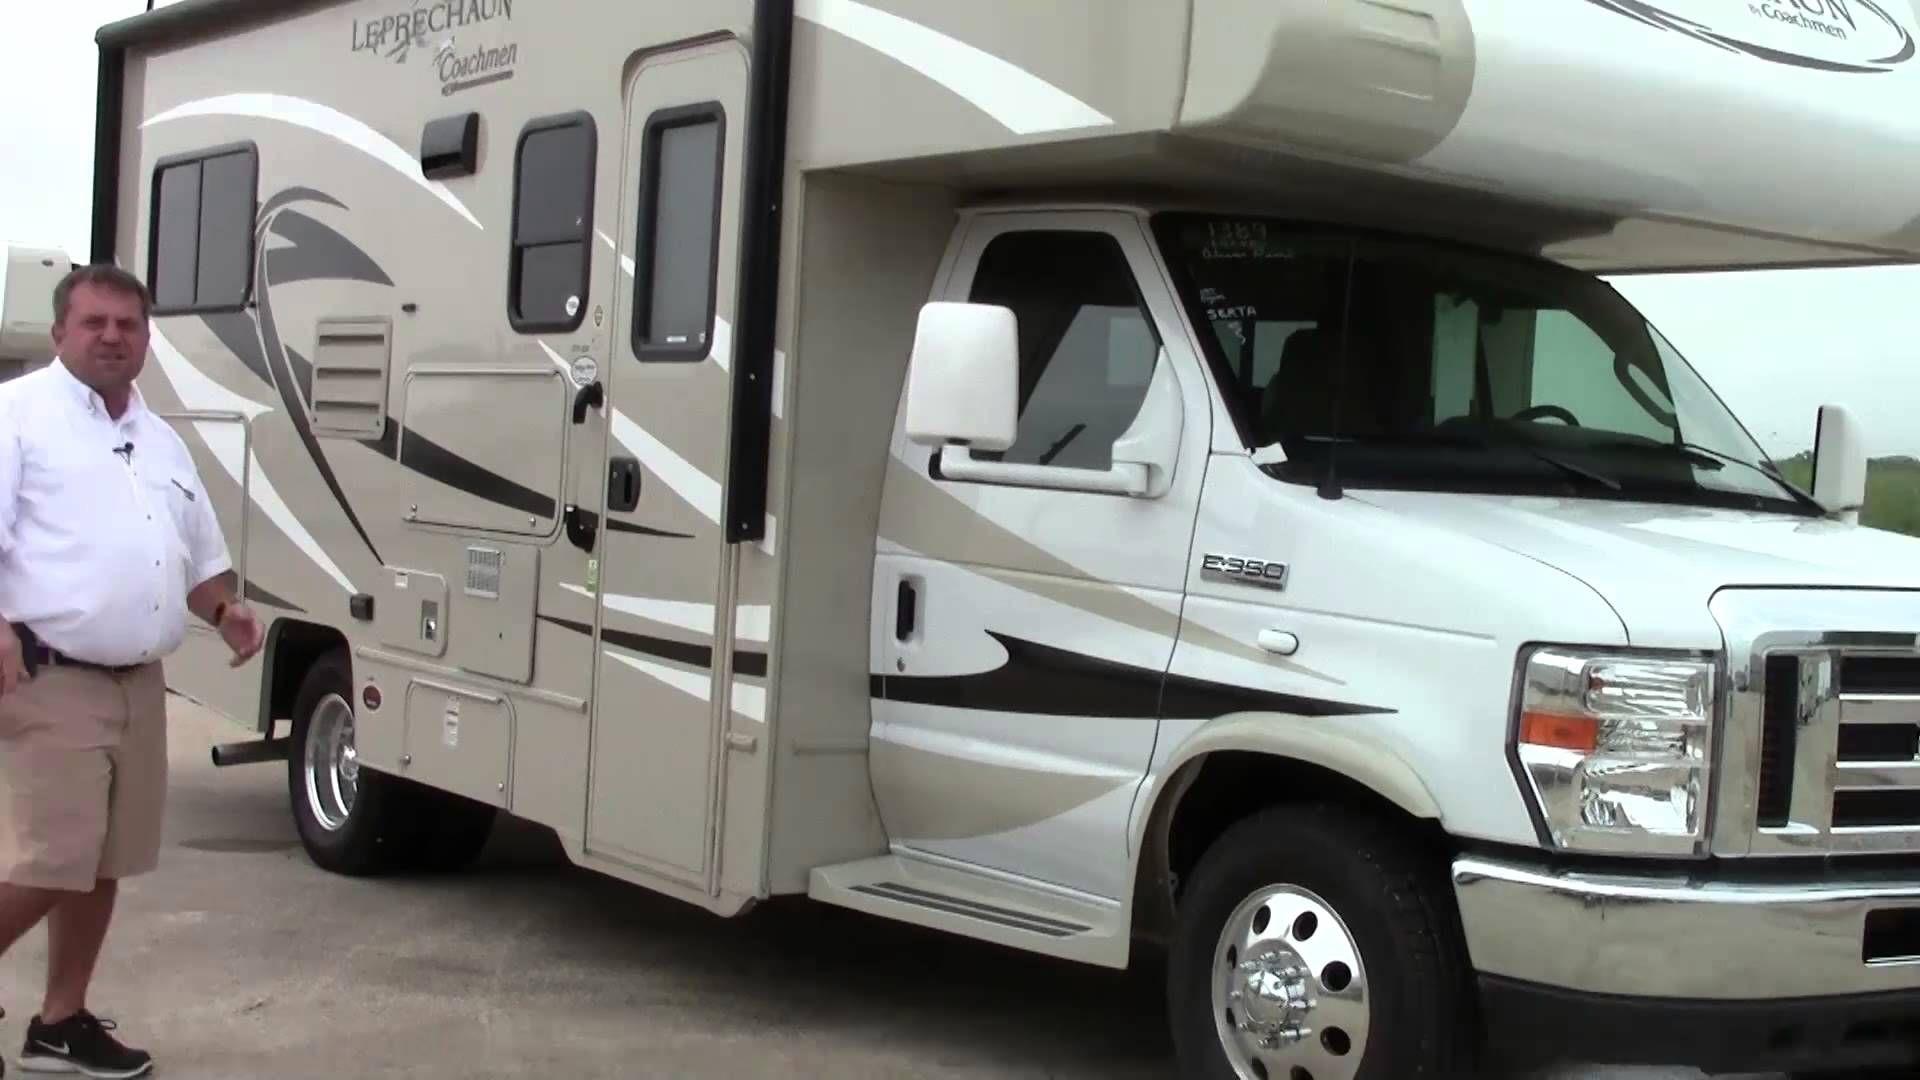 New 2015 Coachmen Leprechaun 220 QB Class C Motorhome RV - Holiday World...